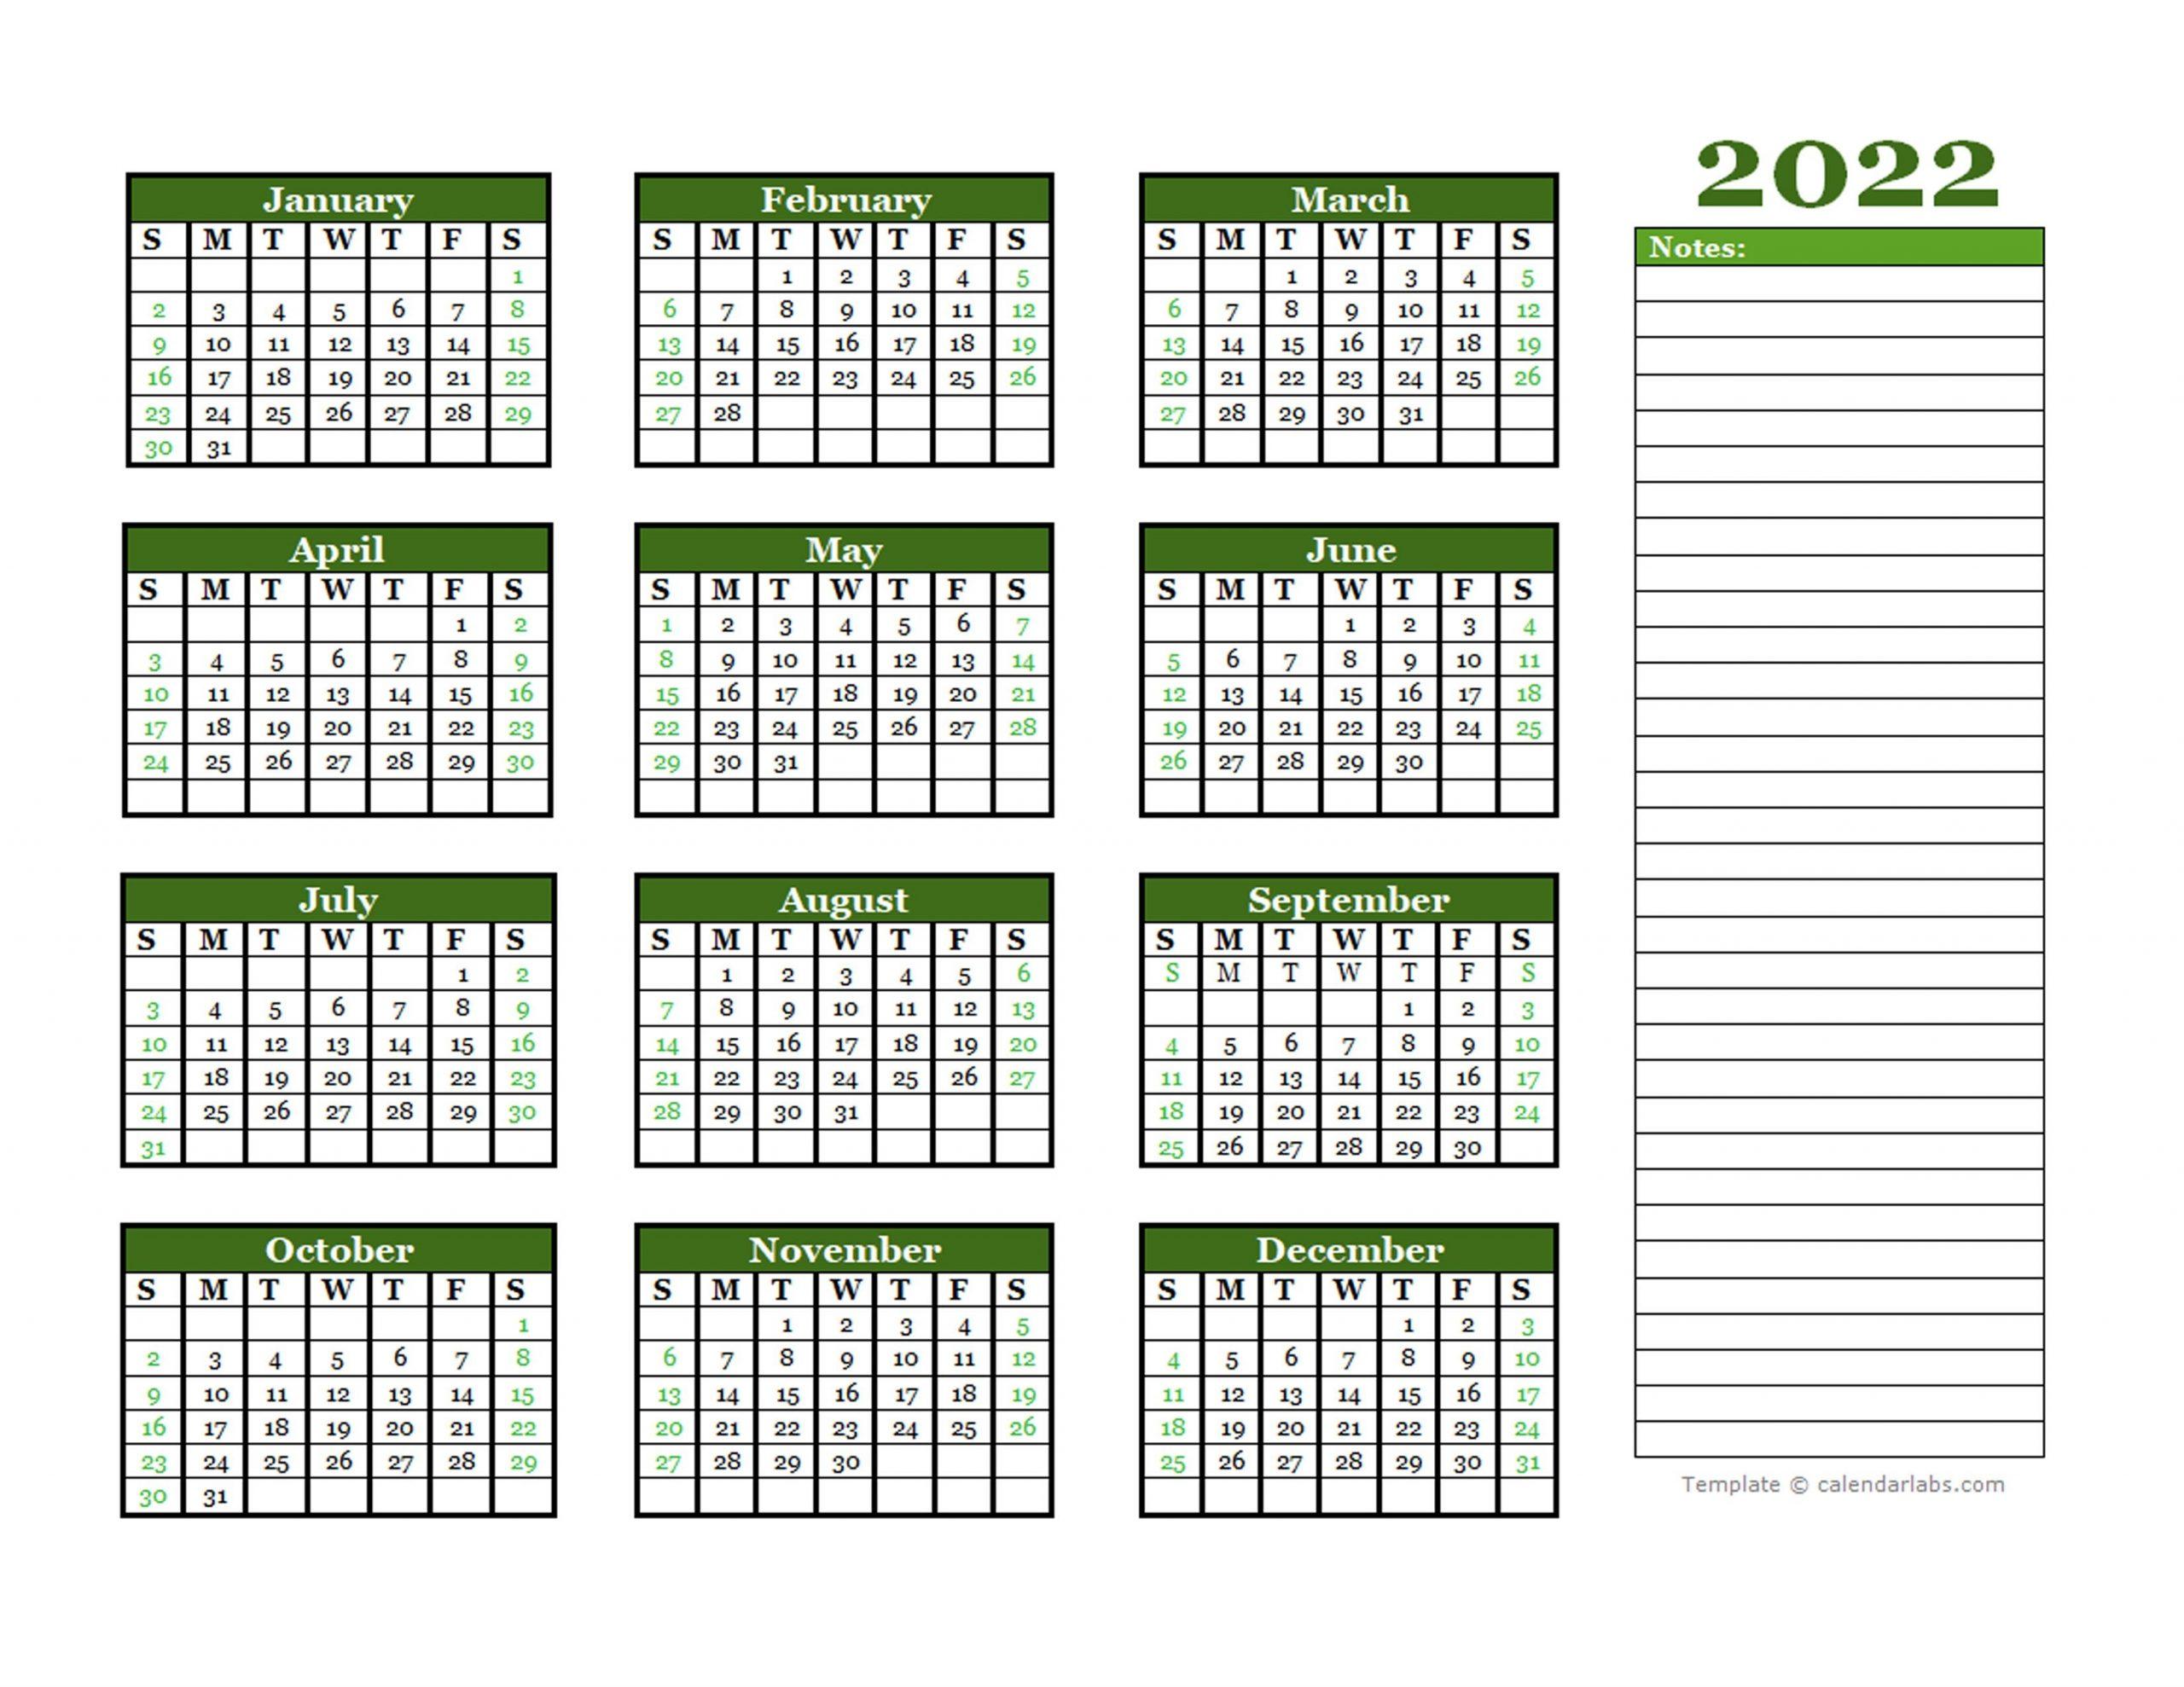 Julian Calendar 2022 Printable | Printable Calendar 2021 with regard to 2021 Printable Julian Date Calendar